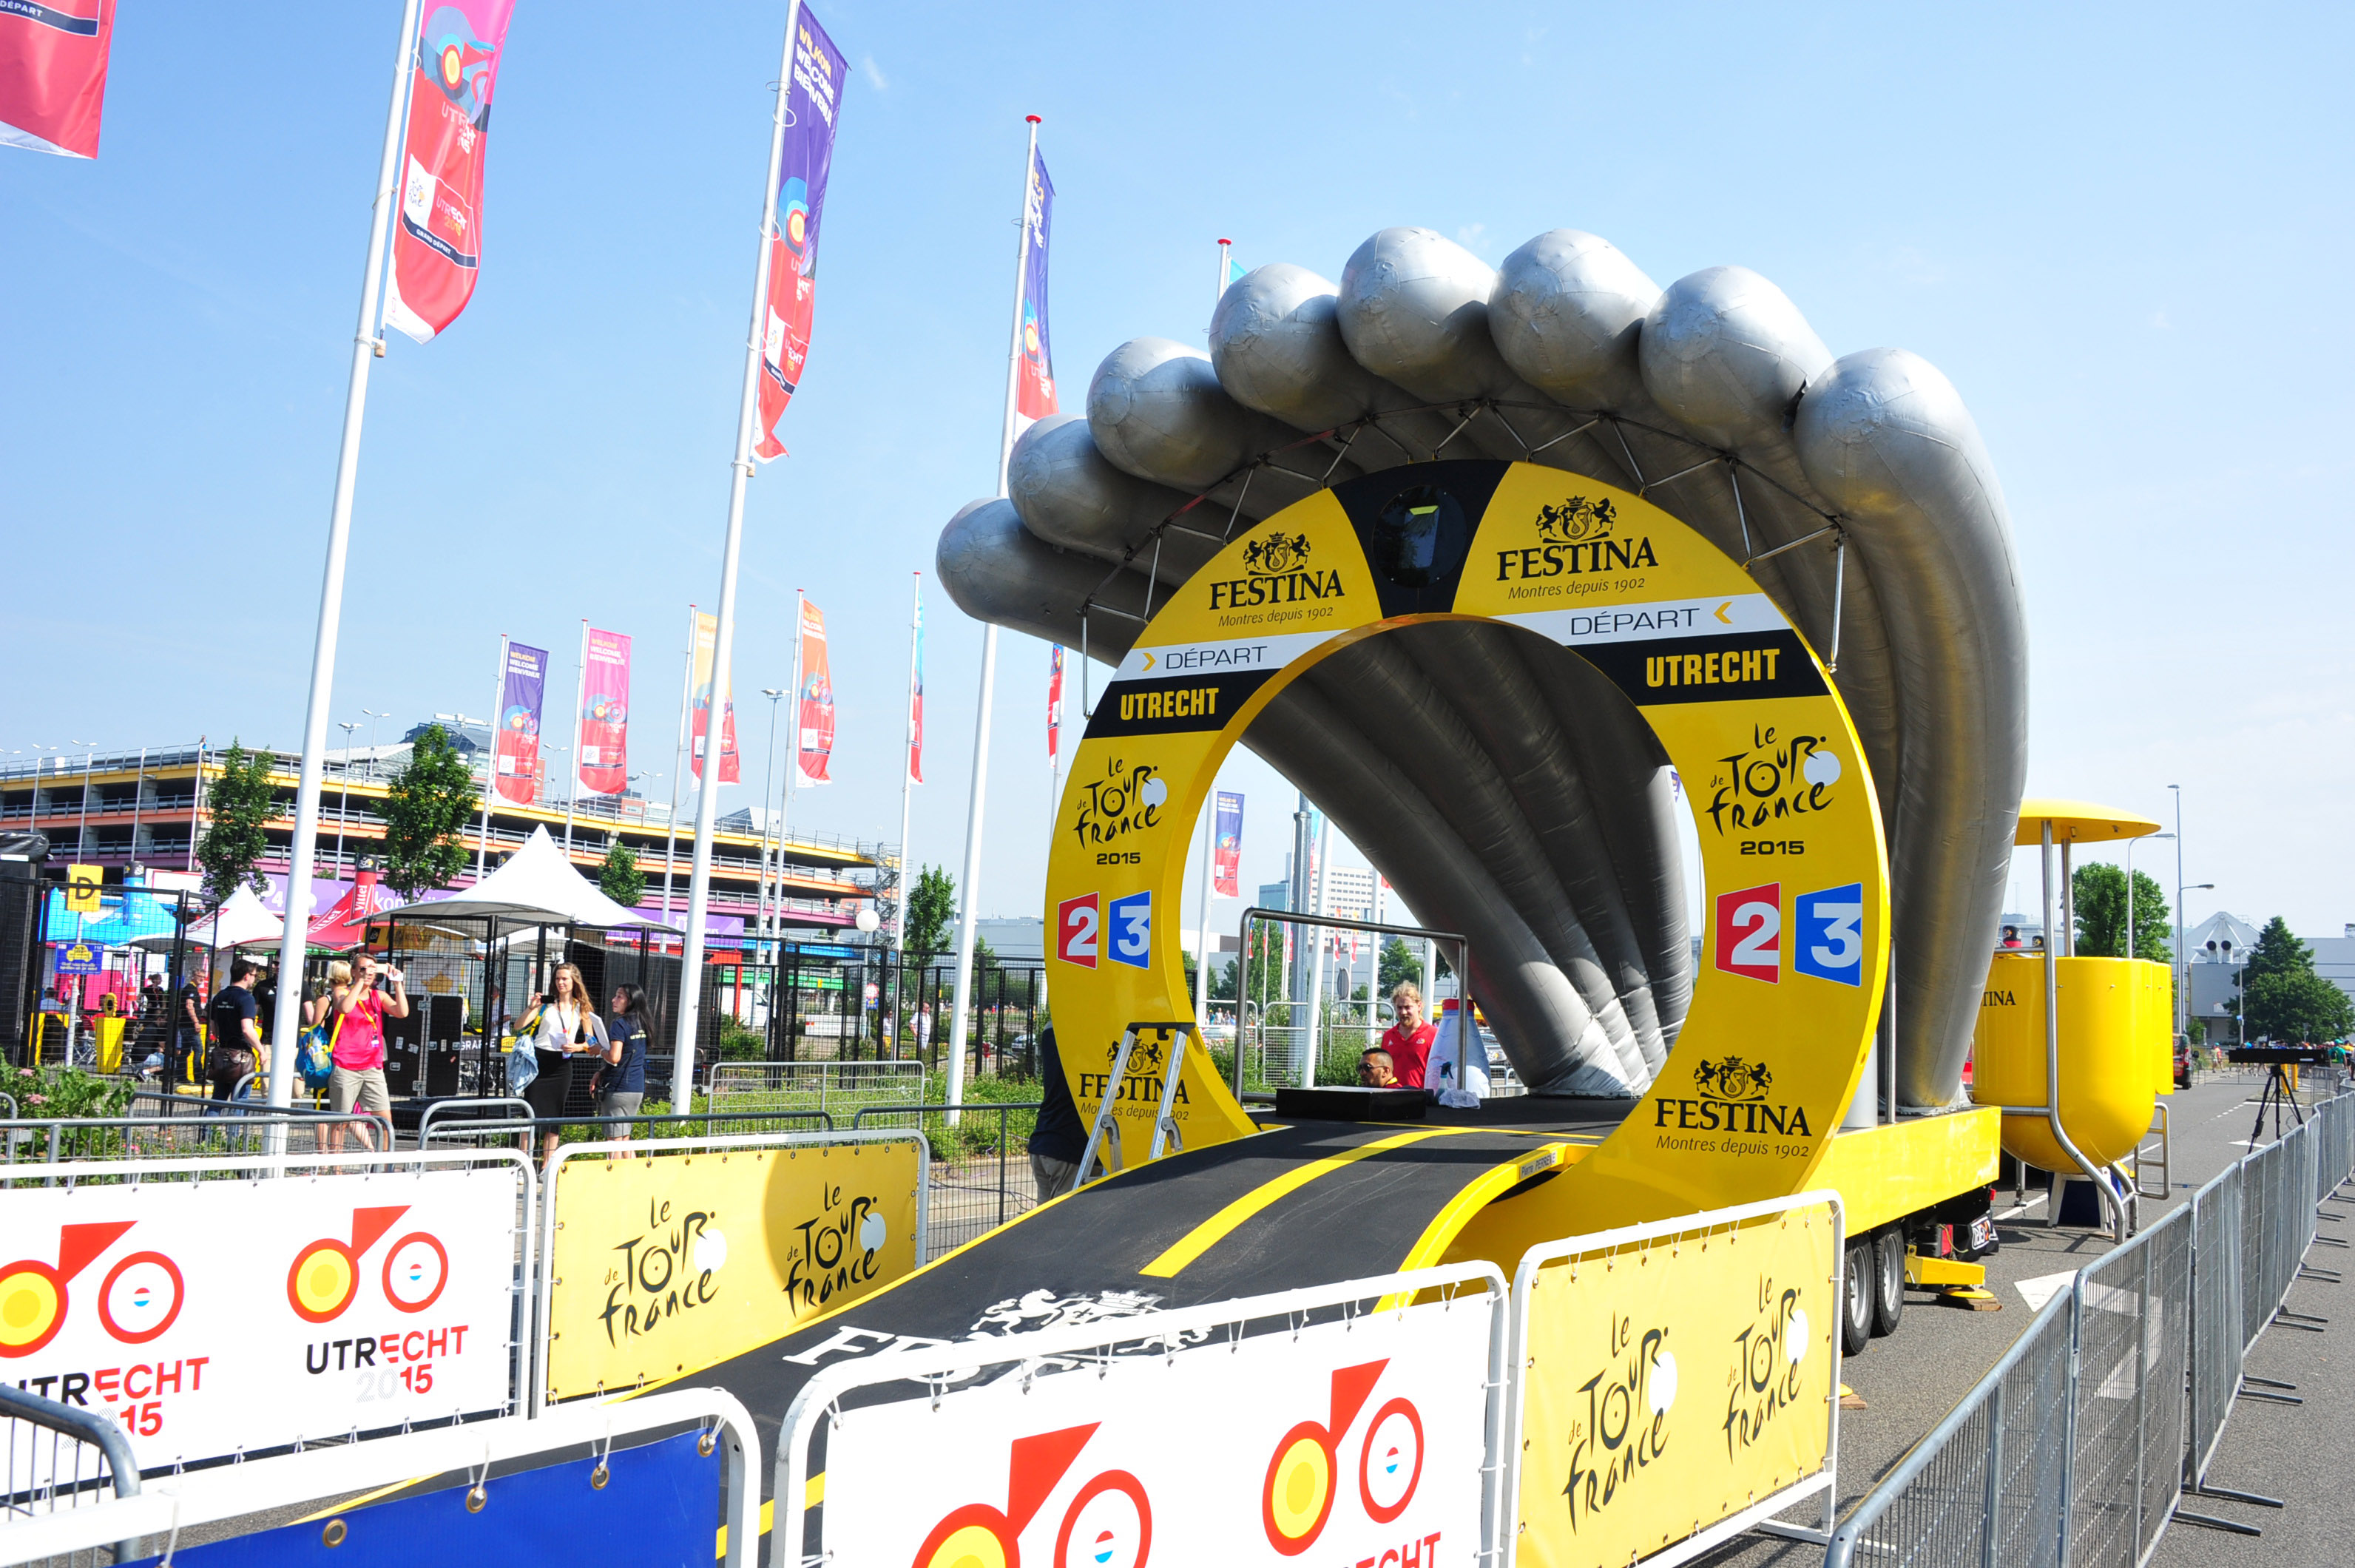 Tour de France 2015 Start der ertsen Etappe